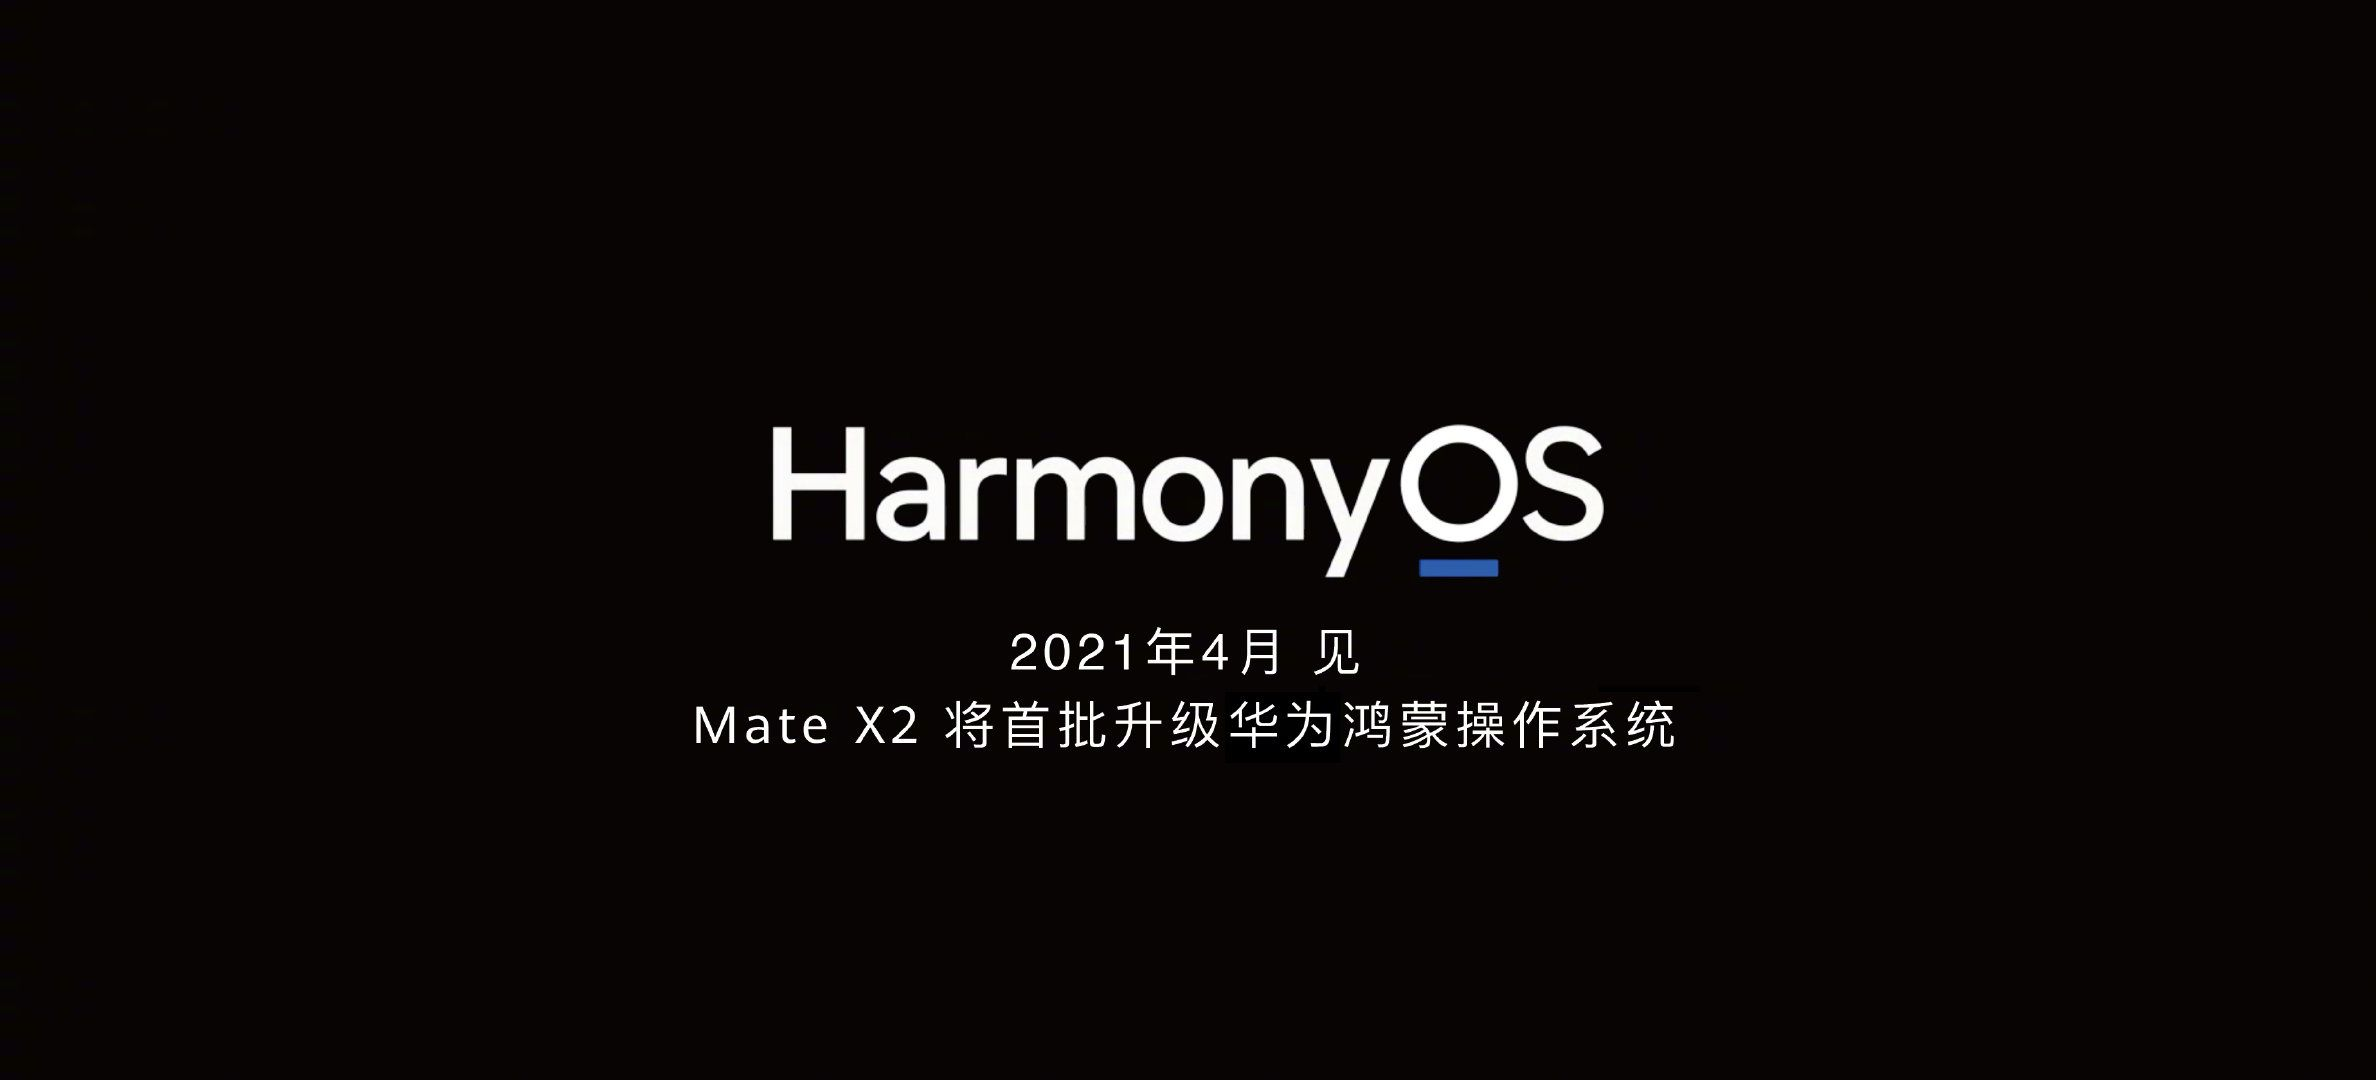 HUAWEI独自OSのHarmonyOSは2021年4月リリース予定、HUAWEI Mate X2が初搭載機のひとつ